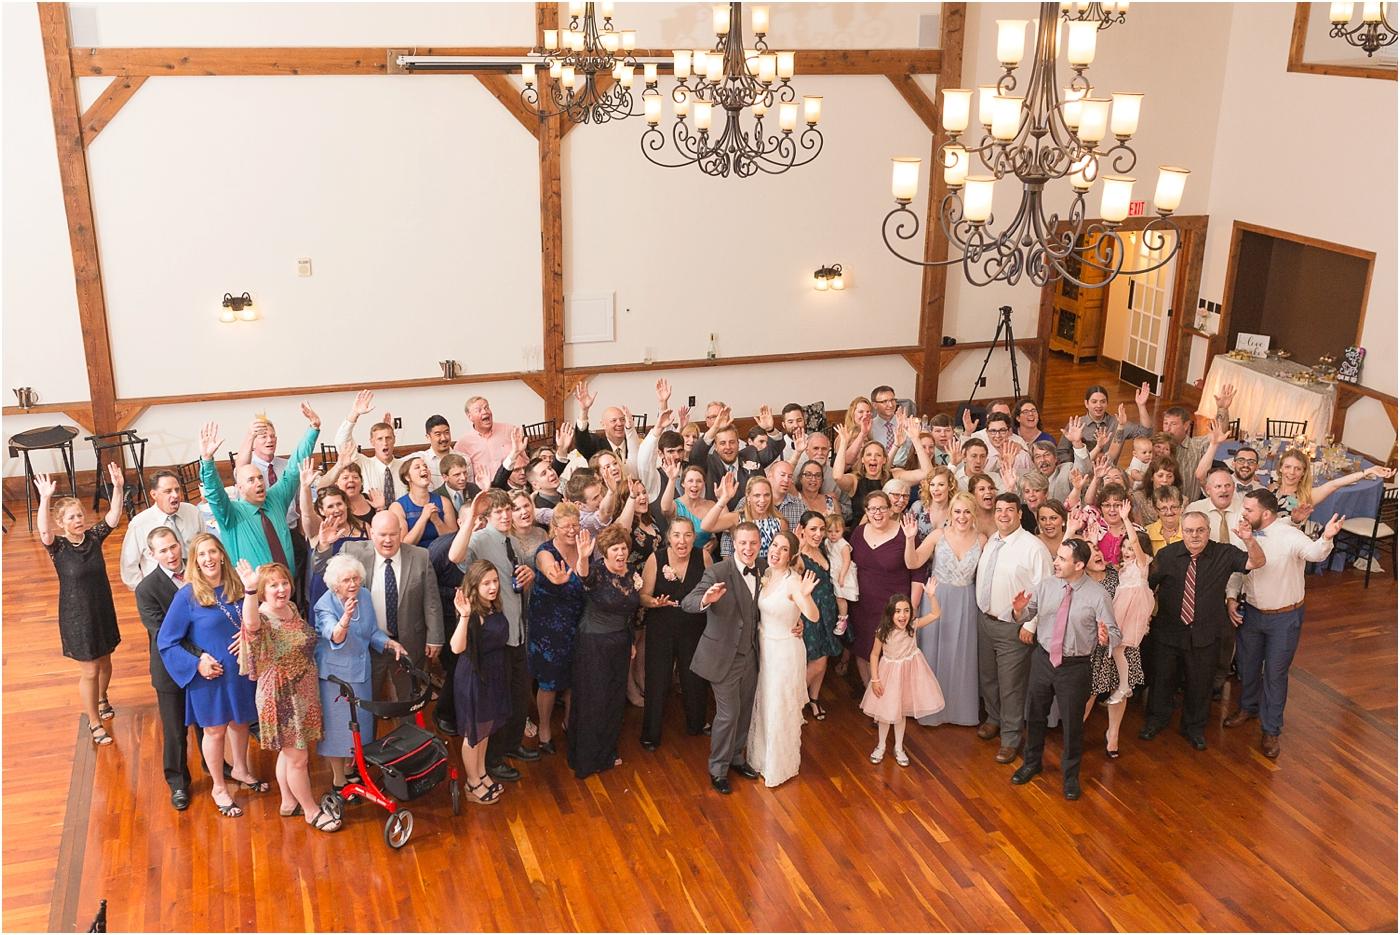 Gettysburg-lodges-wedding-photos-109.jpg